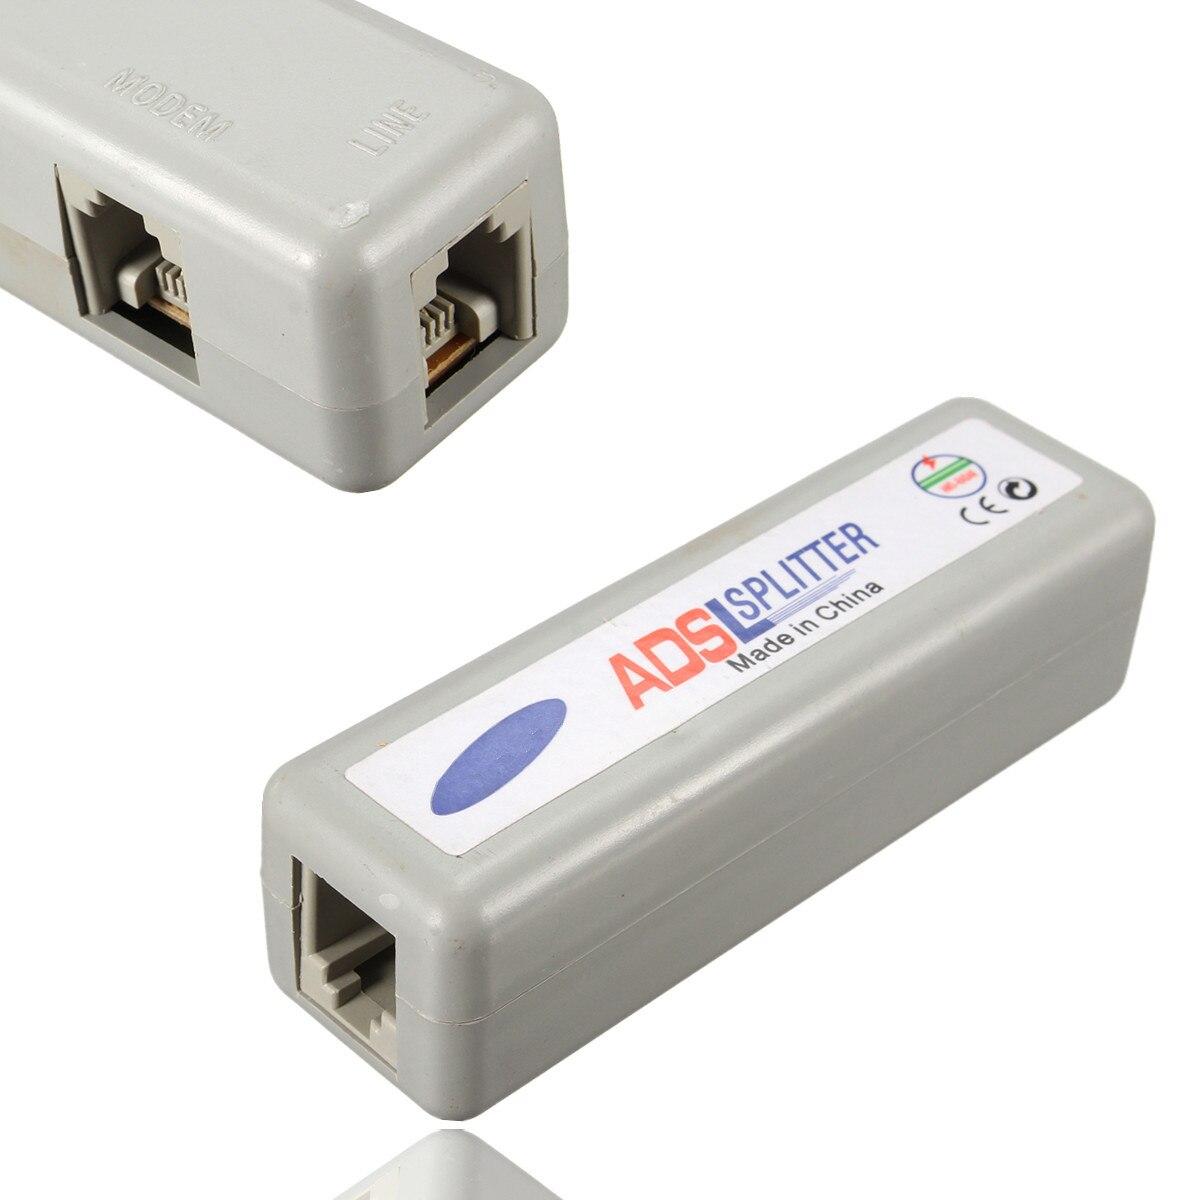 Practical Quality RJ11 ADSL Line Splitter Fax Modem Broadband Phone Network Jack Noise Filter